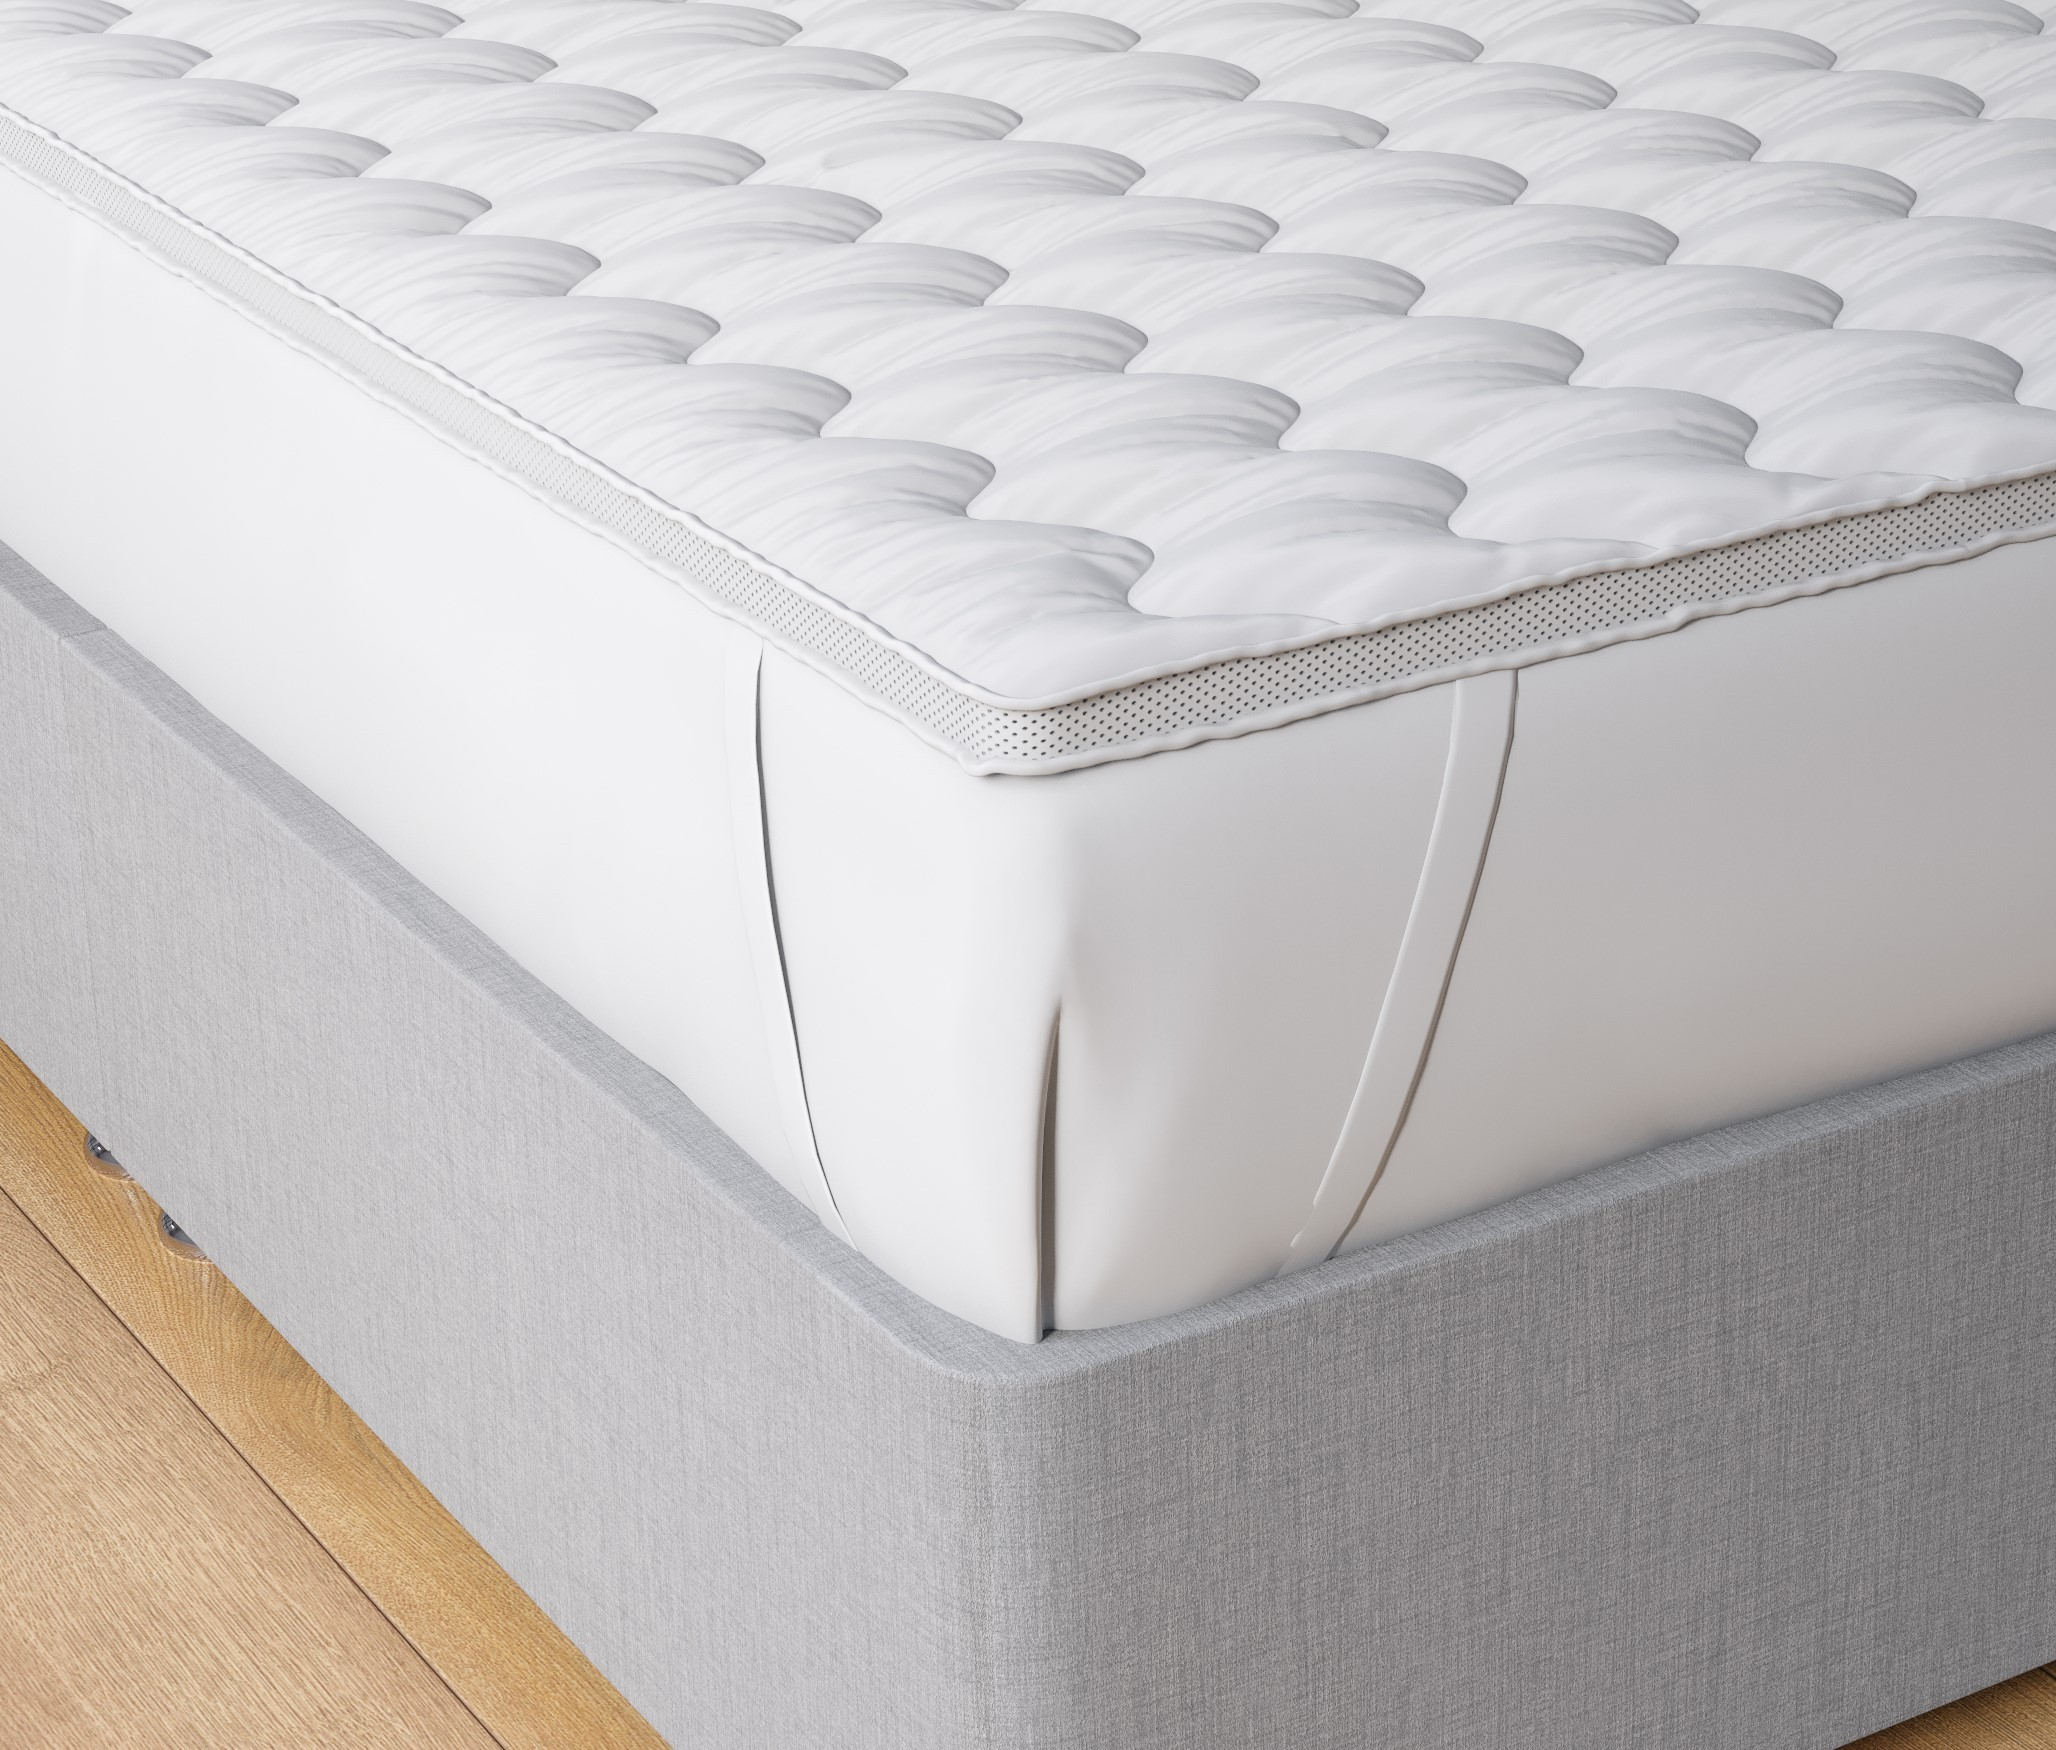 Luxury Microfiber Mattress Topper Ultra Soft Top Hotel